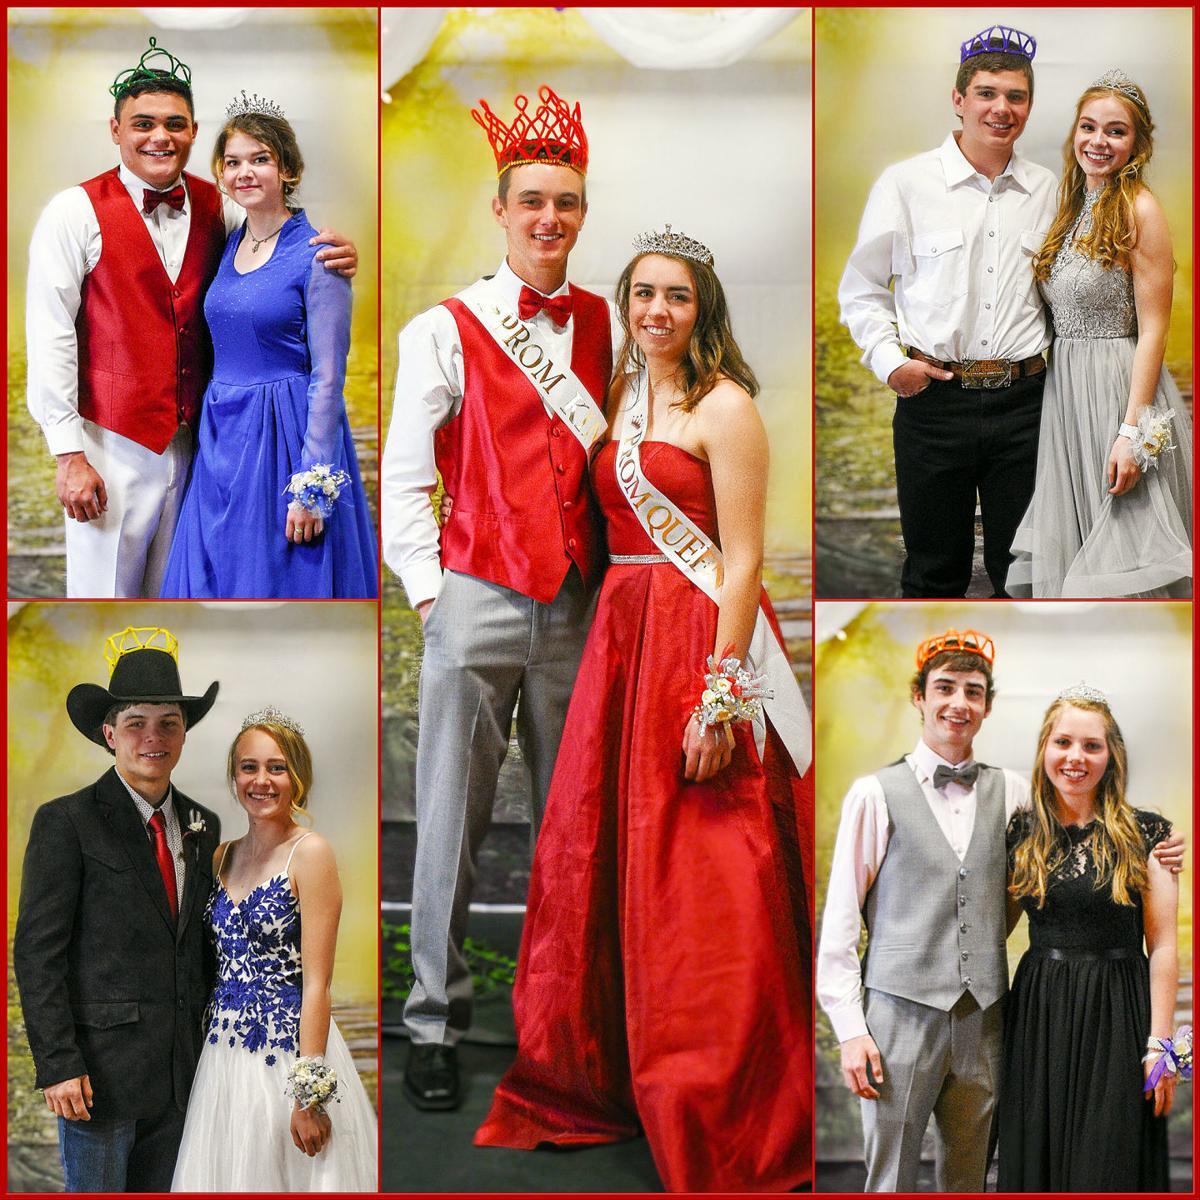 Challis prom royalty